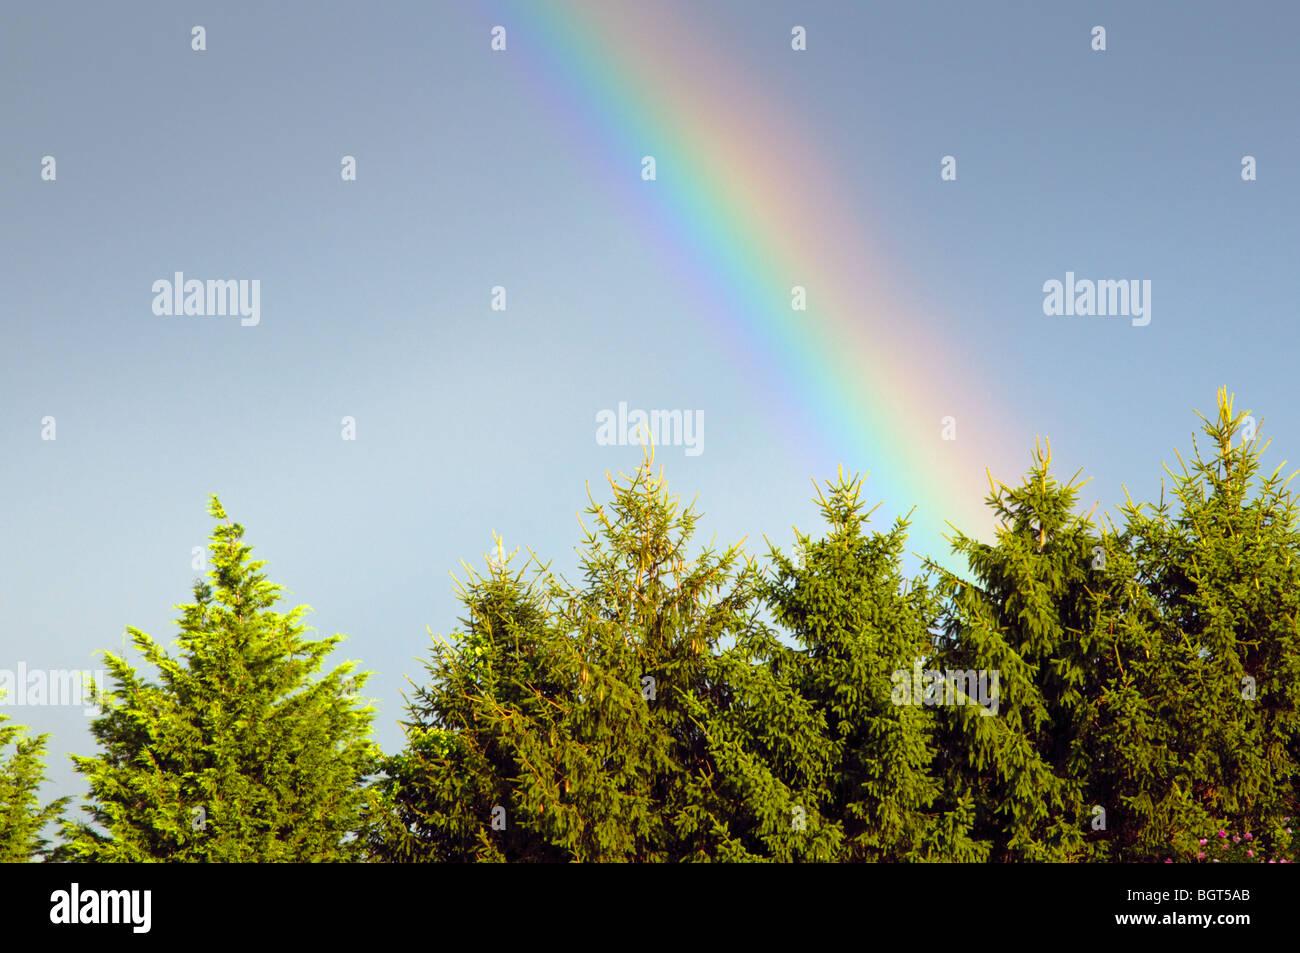 Colorful Rainbow - Stock Image